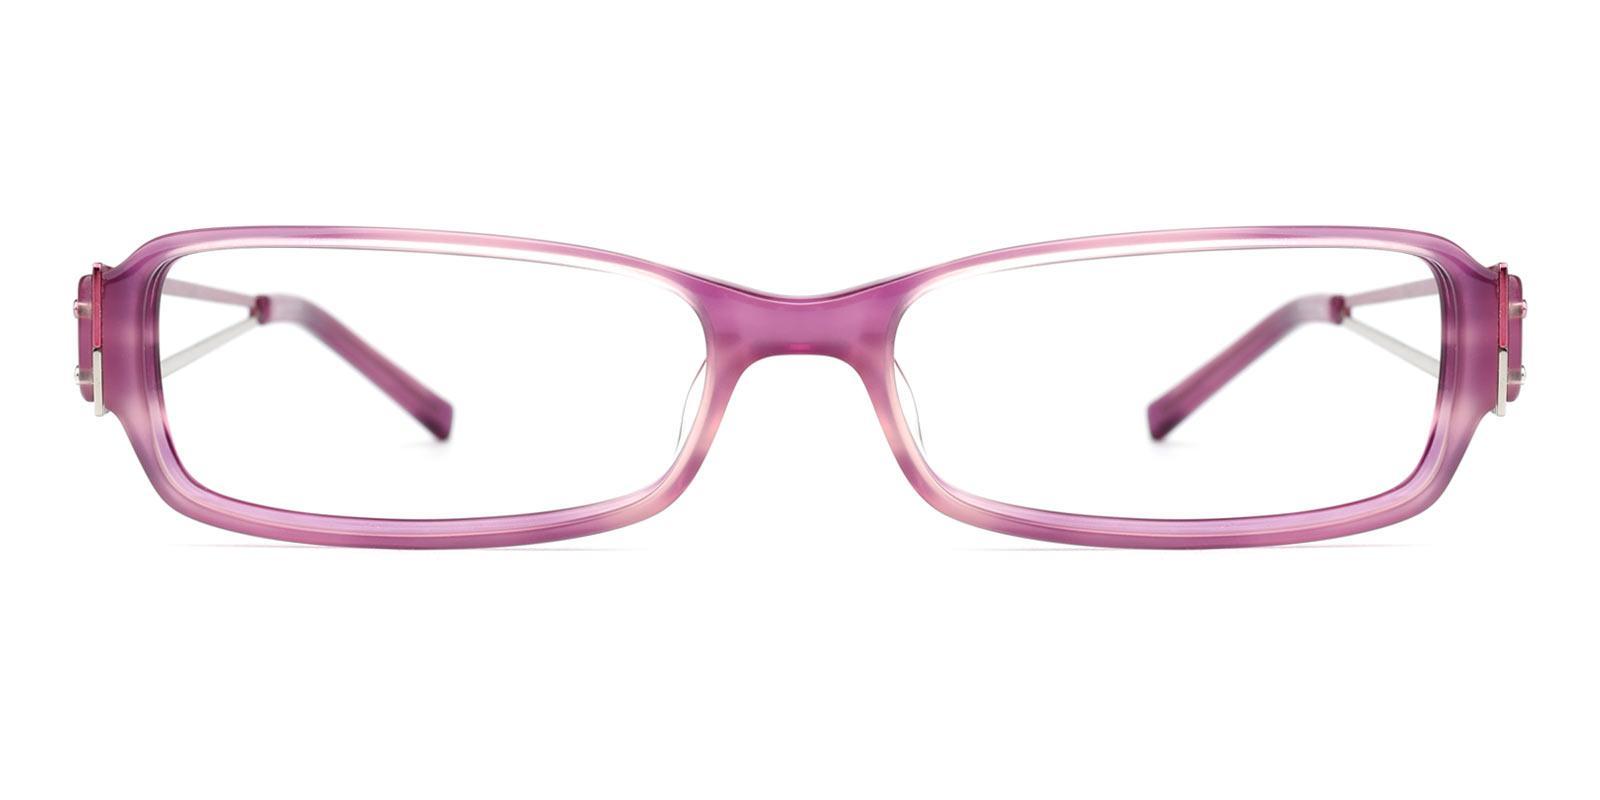 Fanta-Purple-Rectangle-Plastic-Eyeglasses-detail